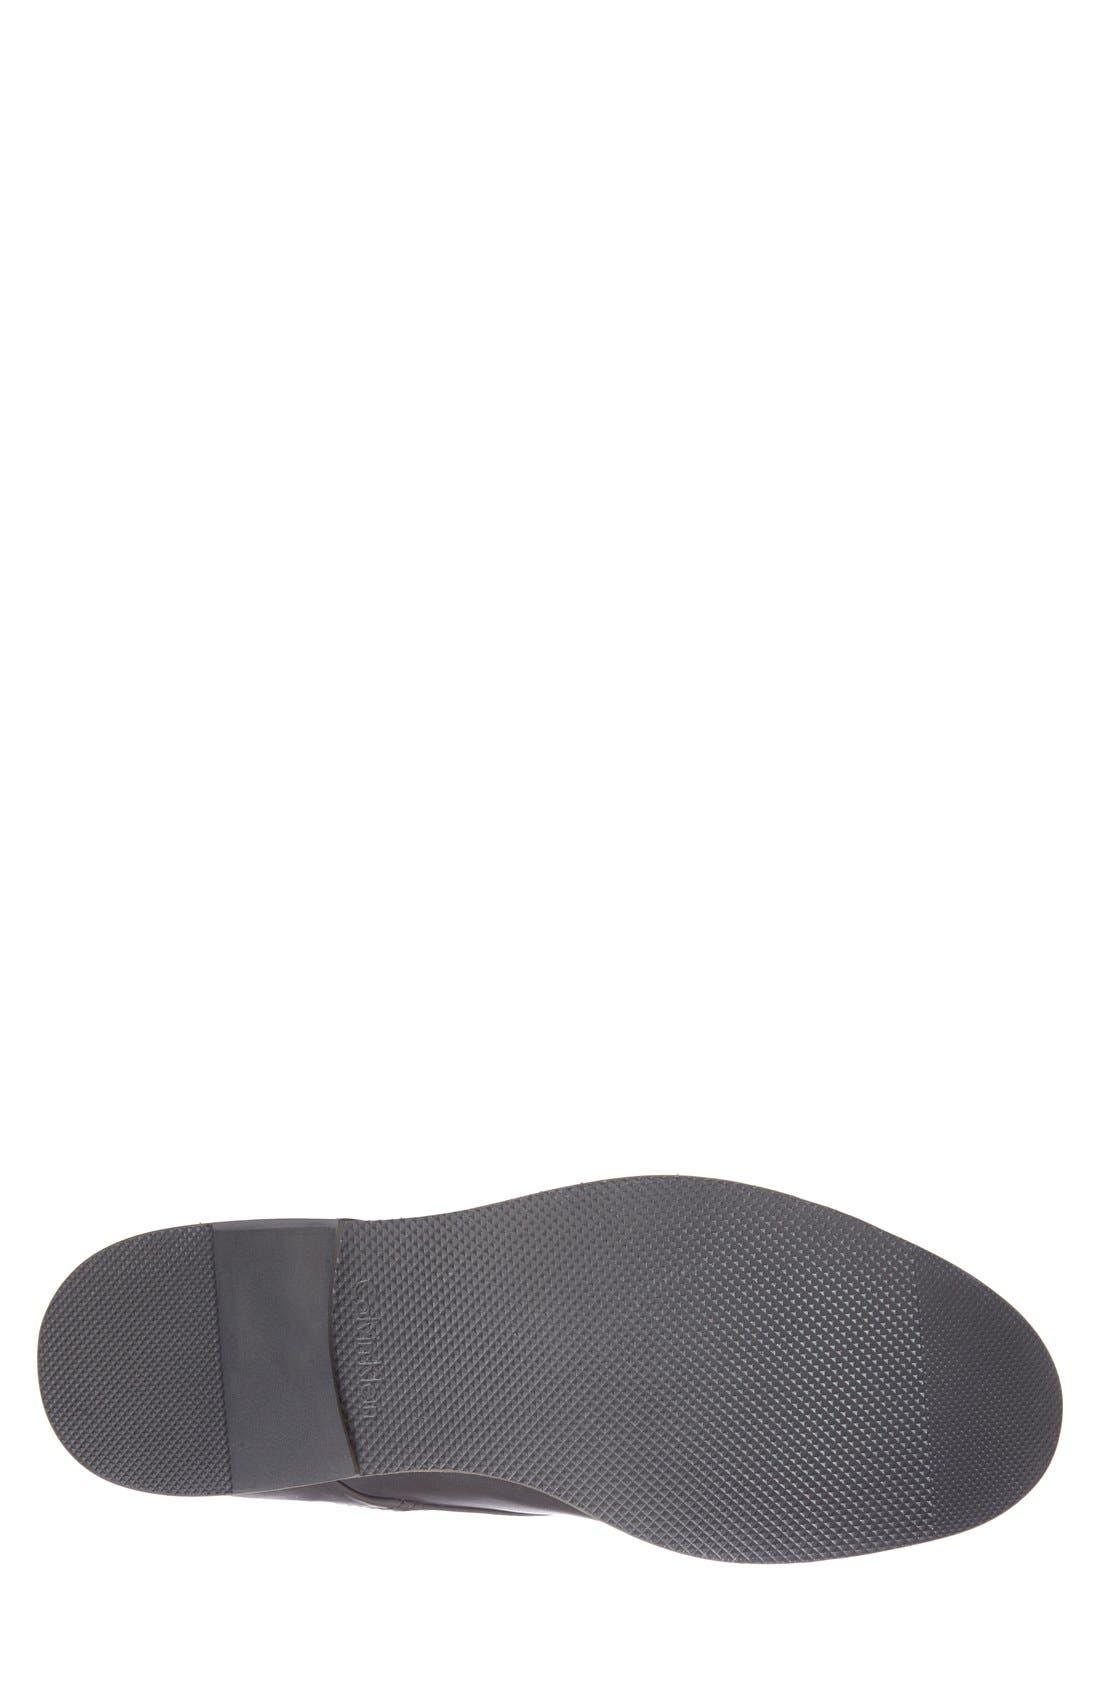 Alternate Image 4  - Calvin Klein 'Walter' Chukka Boot (Men)